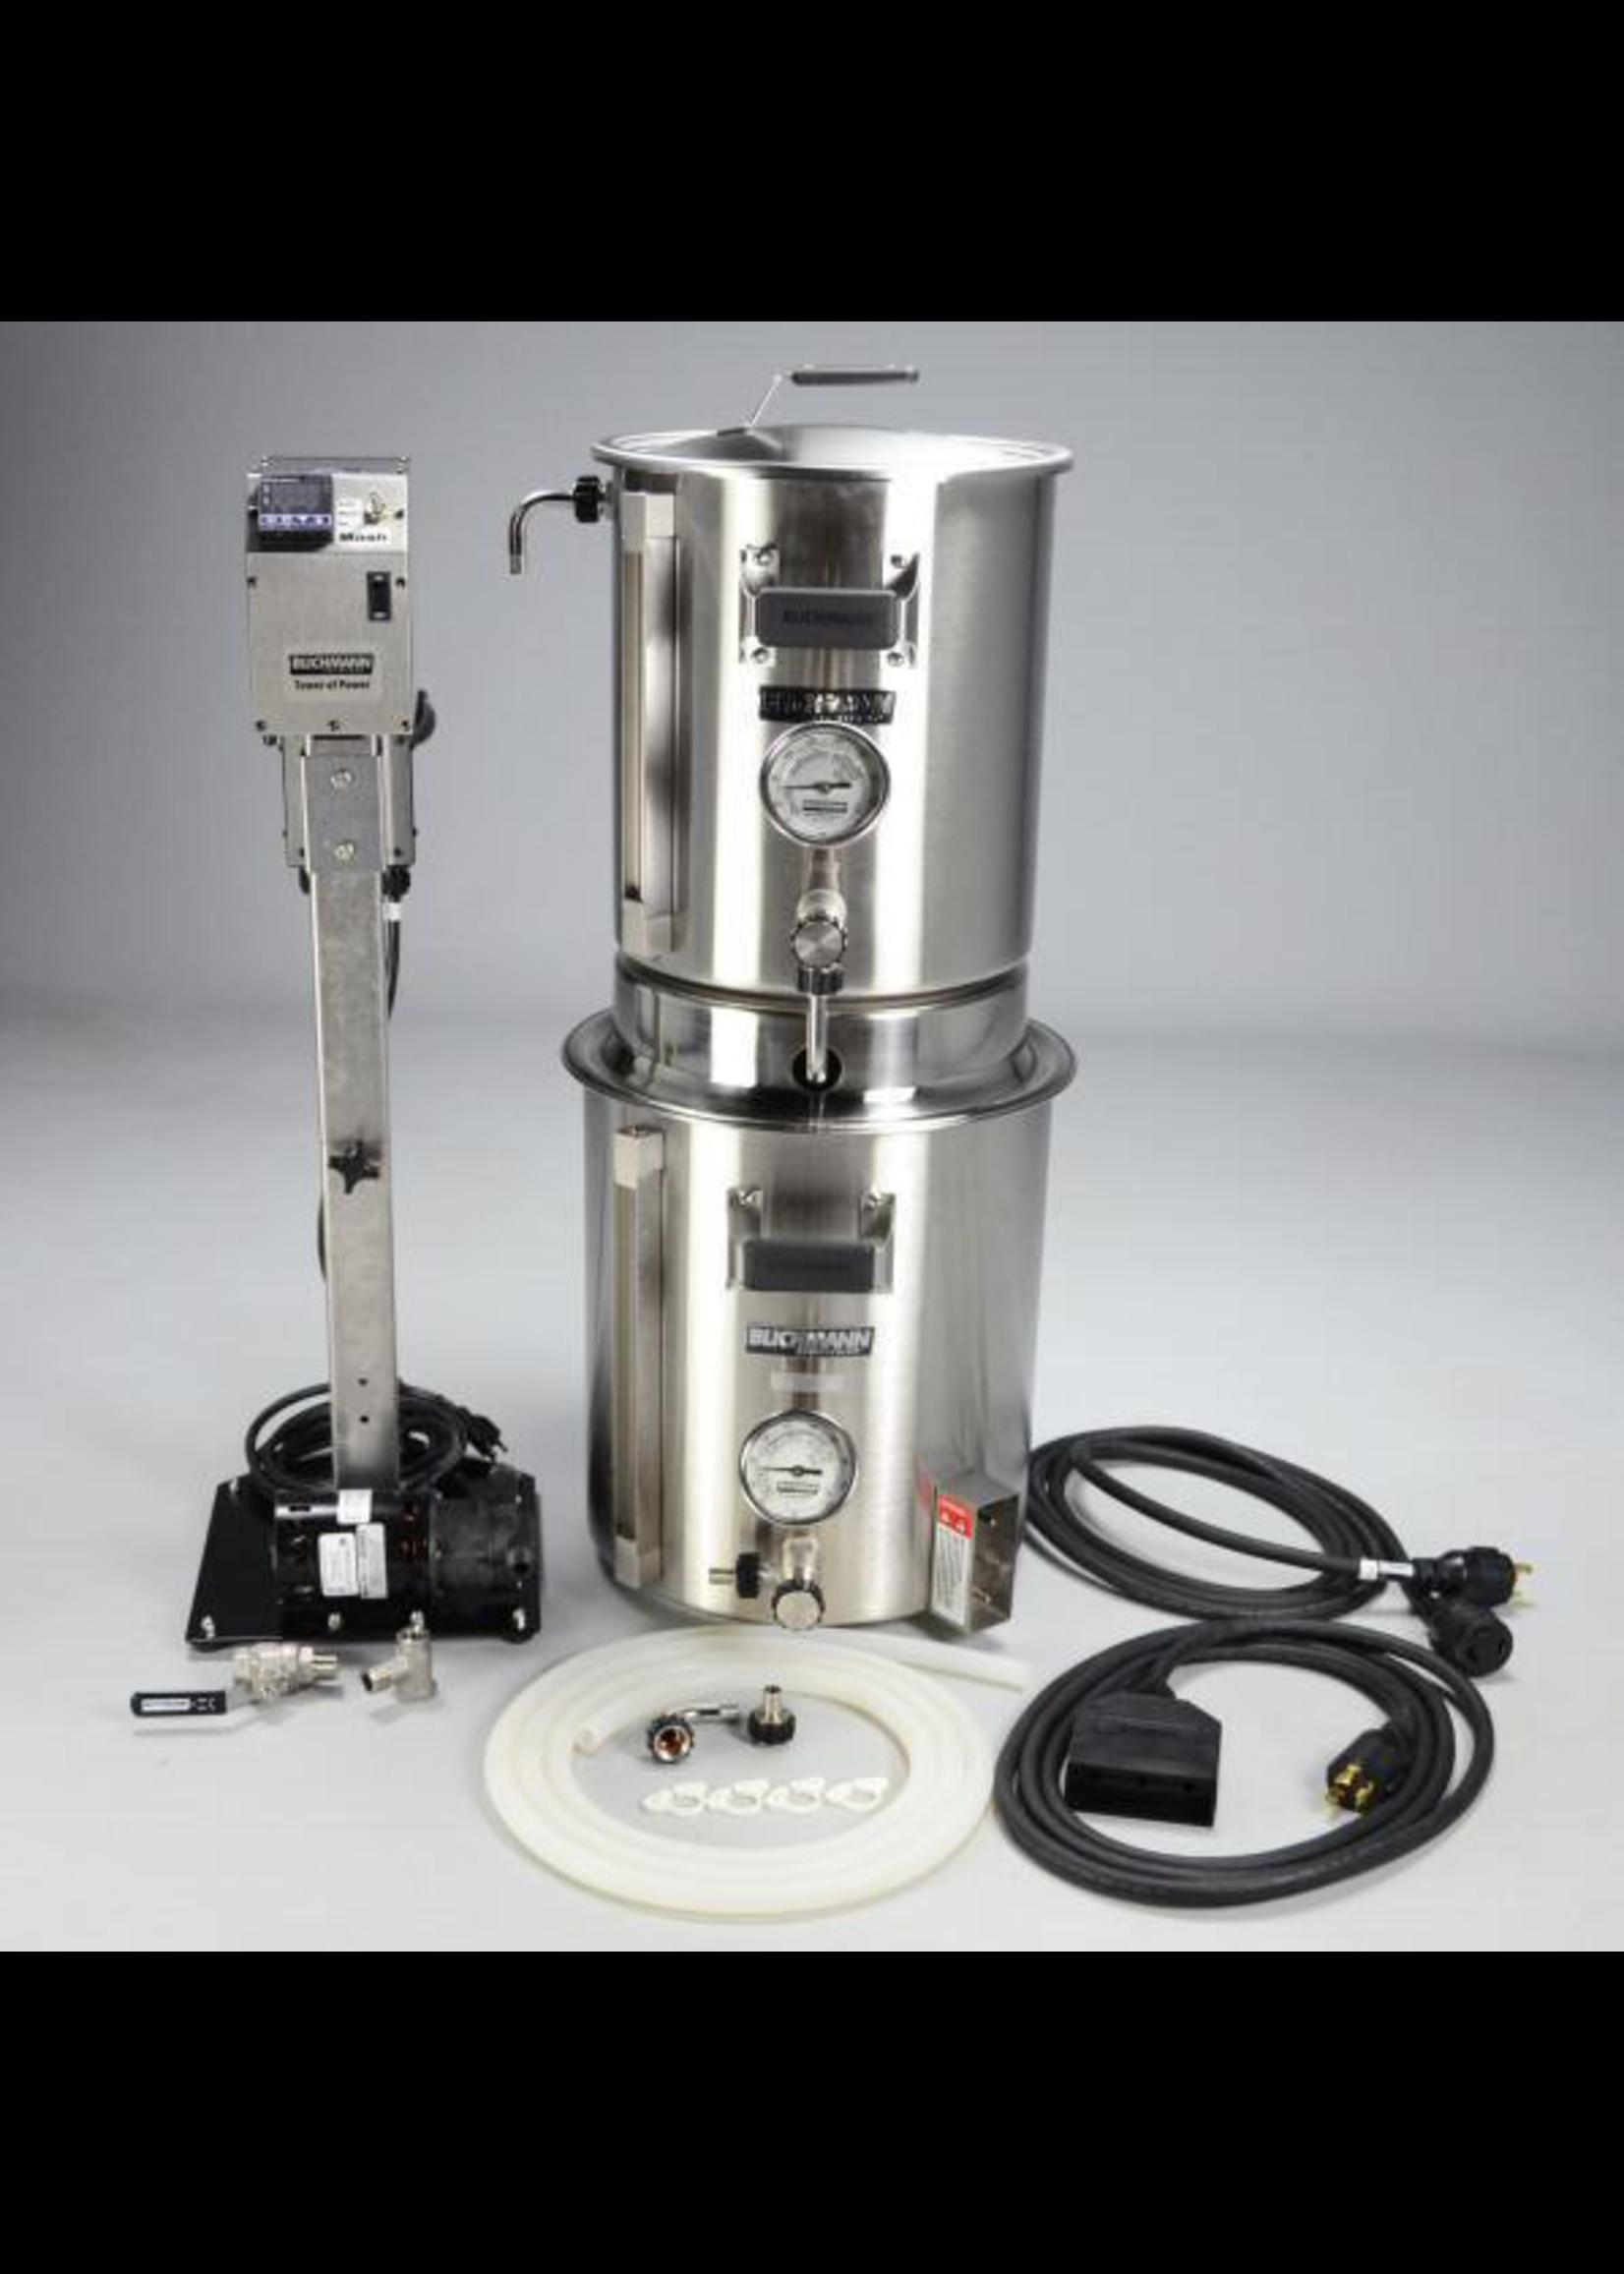 Blichmann Blichmann BrewEasy - Turnkey Kit - 240V FULL VERSION - 10 Gallon G2